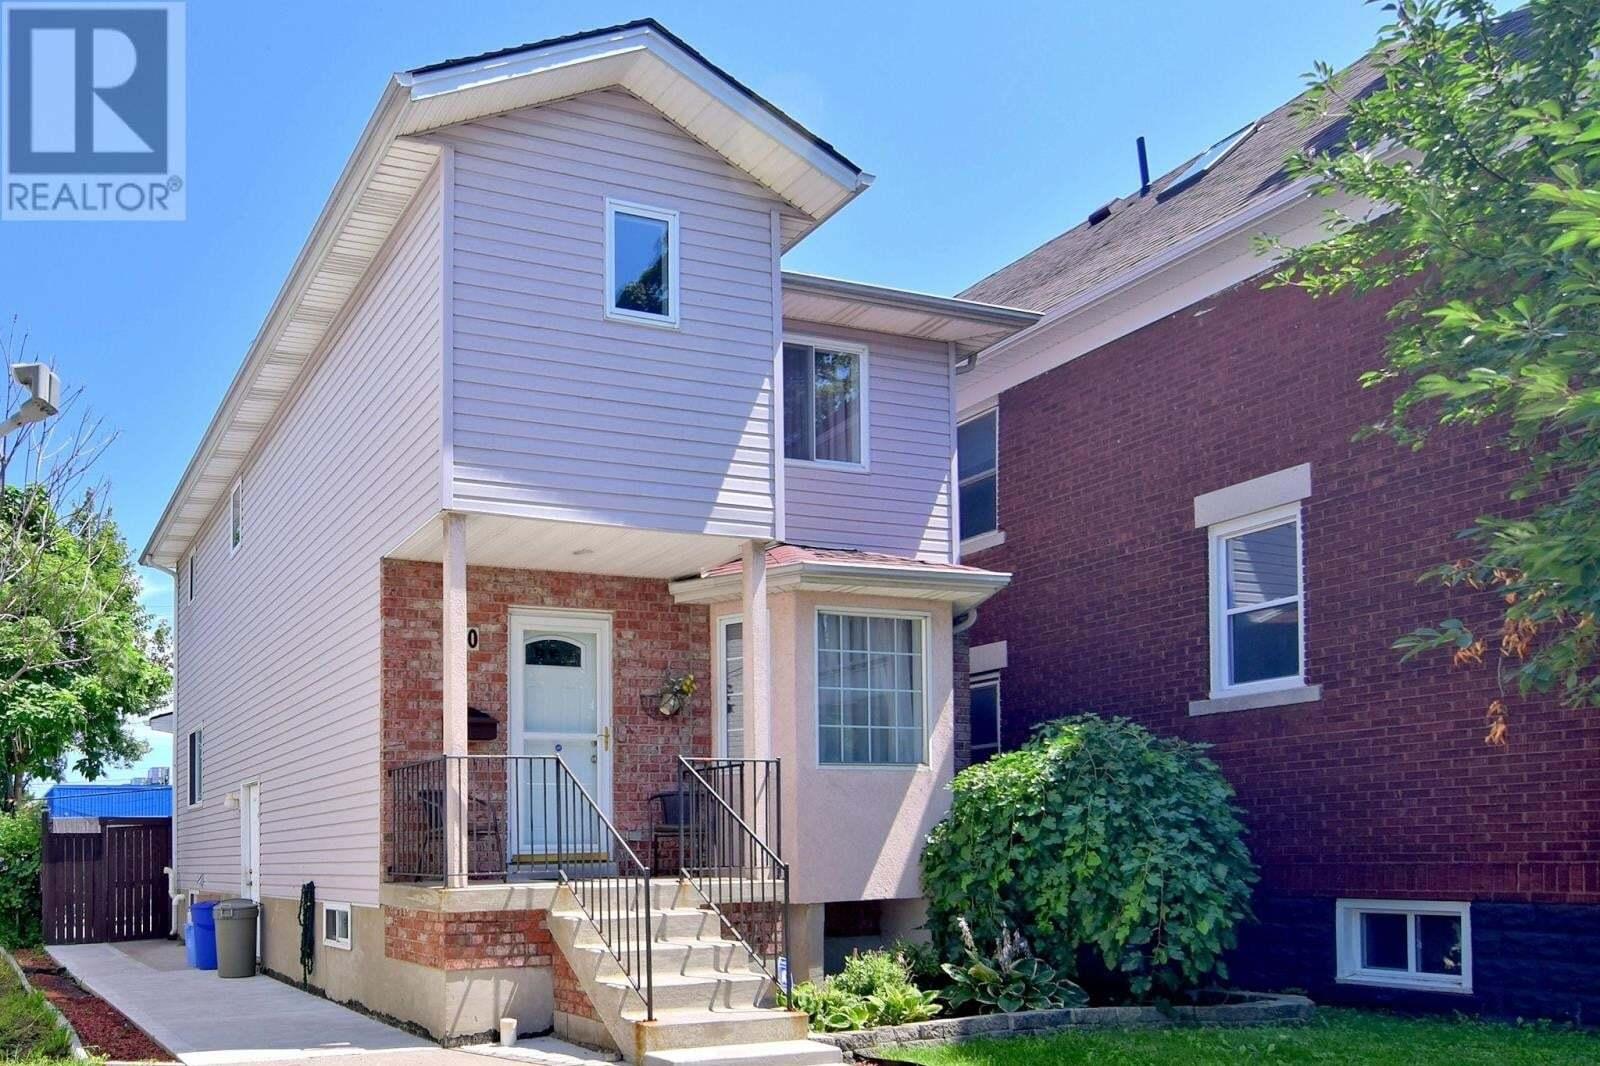 House for sale at 930 Windsor  Windsor Ontario - MLS: 20009917